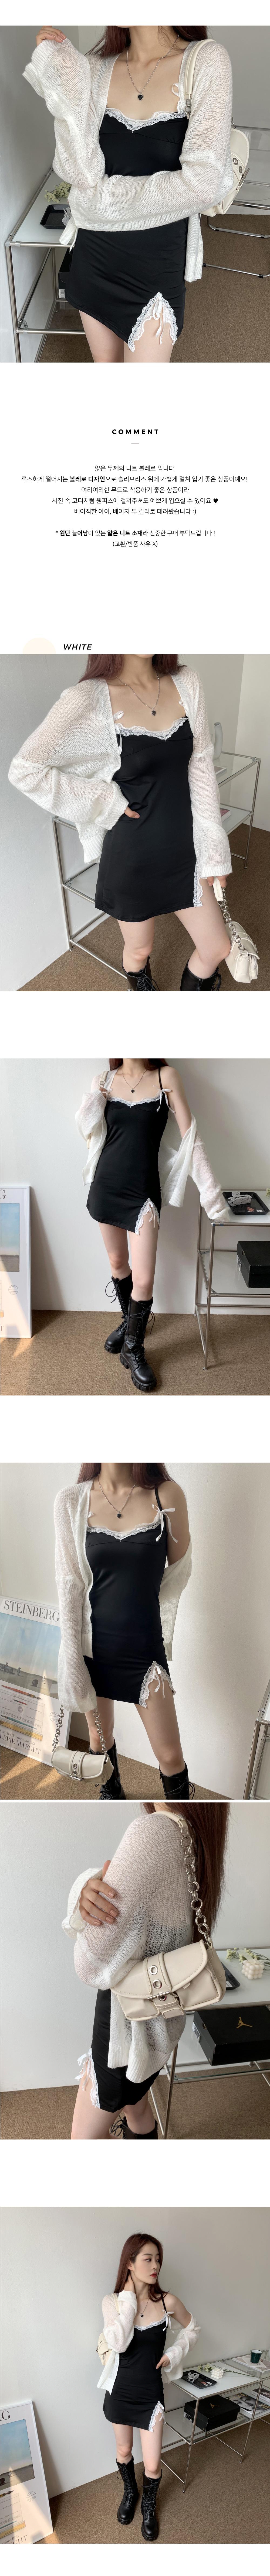 Cheese Loose-fit Summer Knitwear Bolero Cardigan